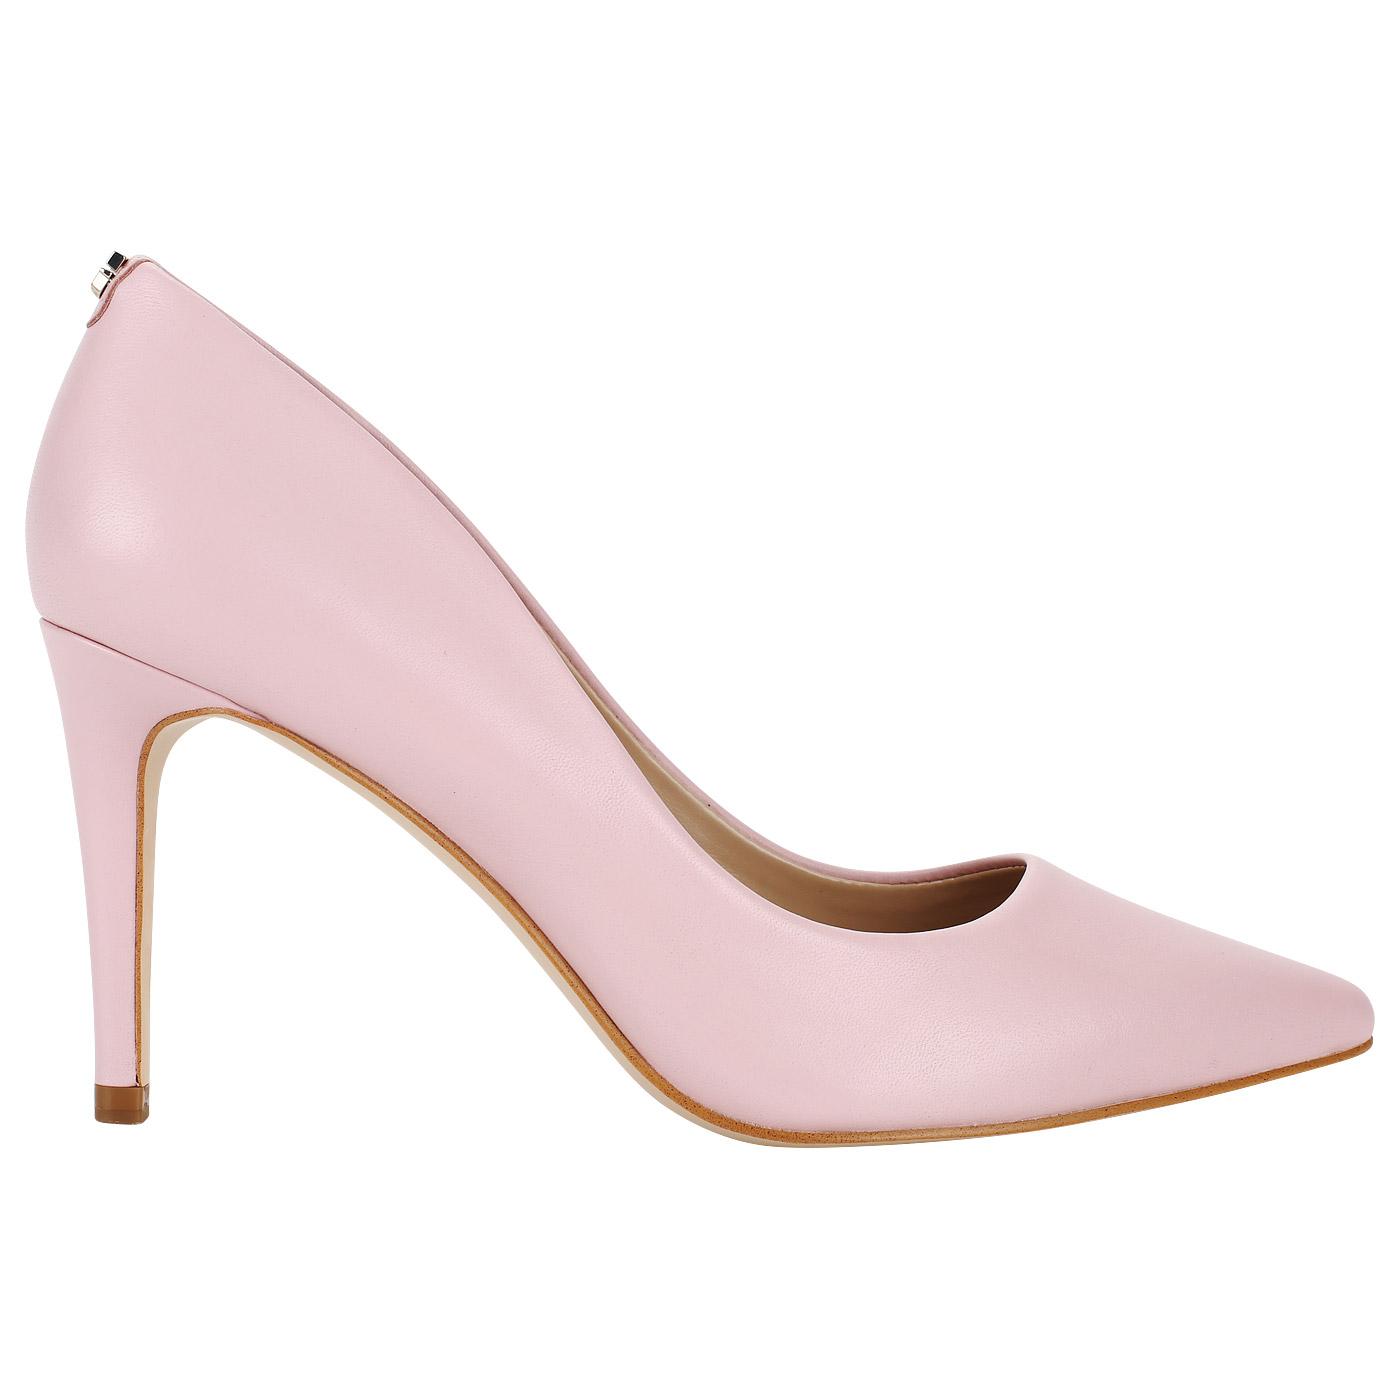 6e11b30e3 Женские туфли-лодочки Guess Bennie2 FLBNN1 LEA08_pink*39-i ...